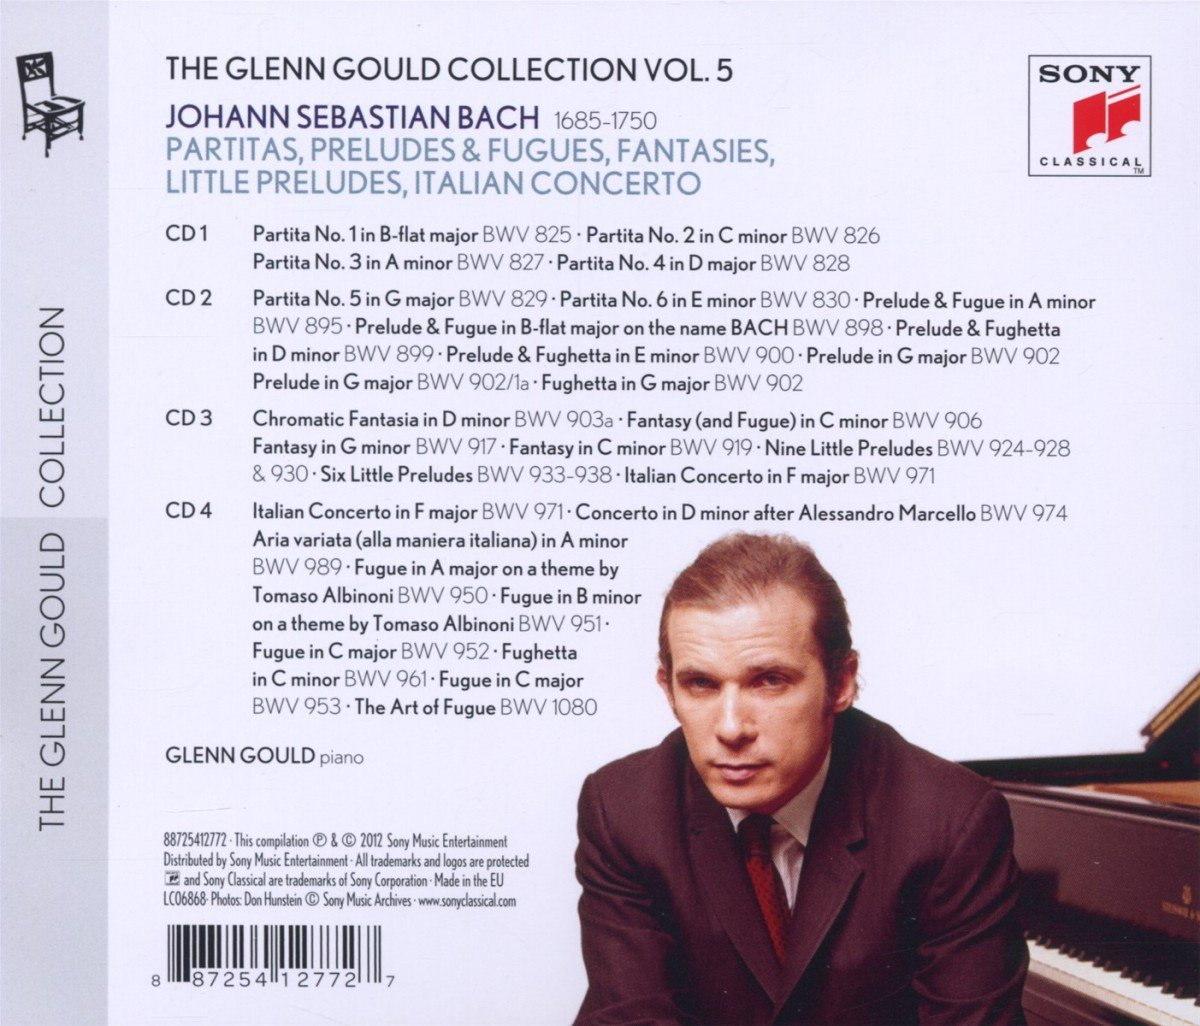 Glenn Gould Plays Bach: 6 Partitas Bwv 825-830; Chromatic Fantasy Bwv 903: Glenn Gould: Amazon.es: Música